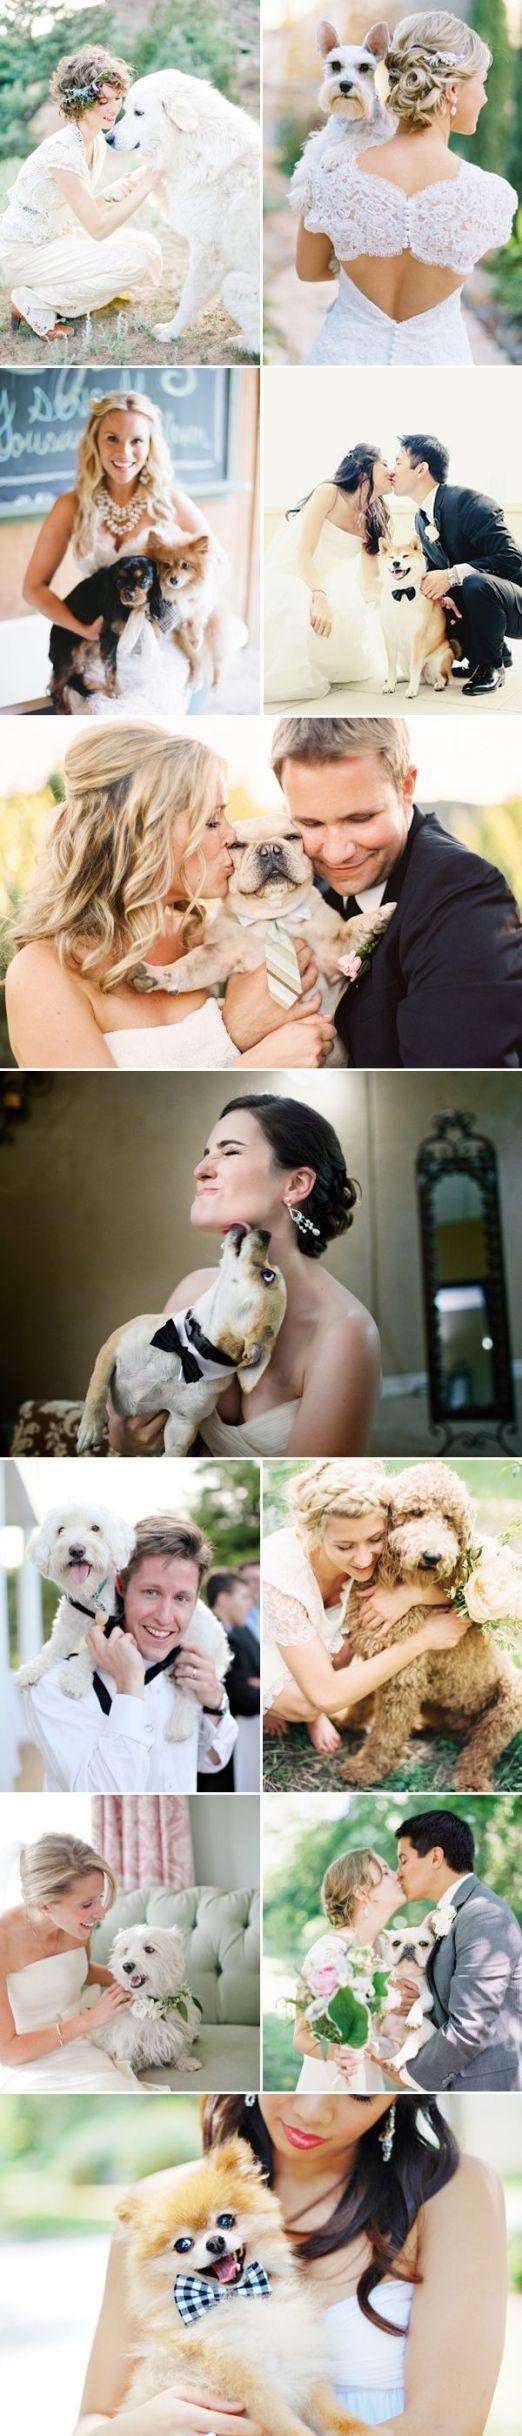 dog wedding 7